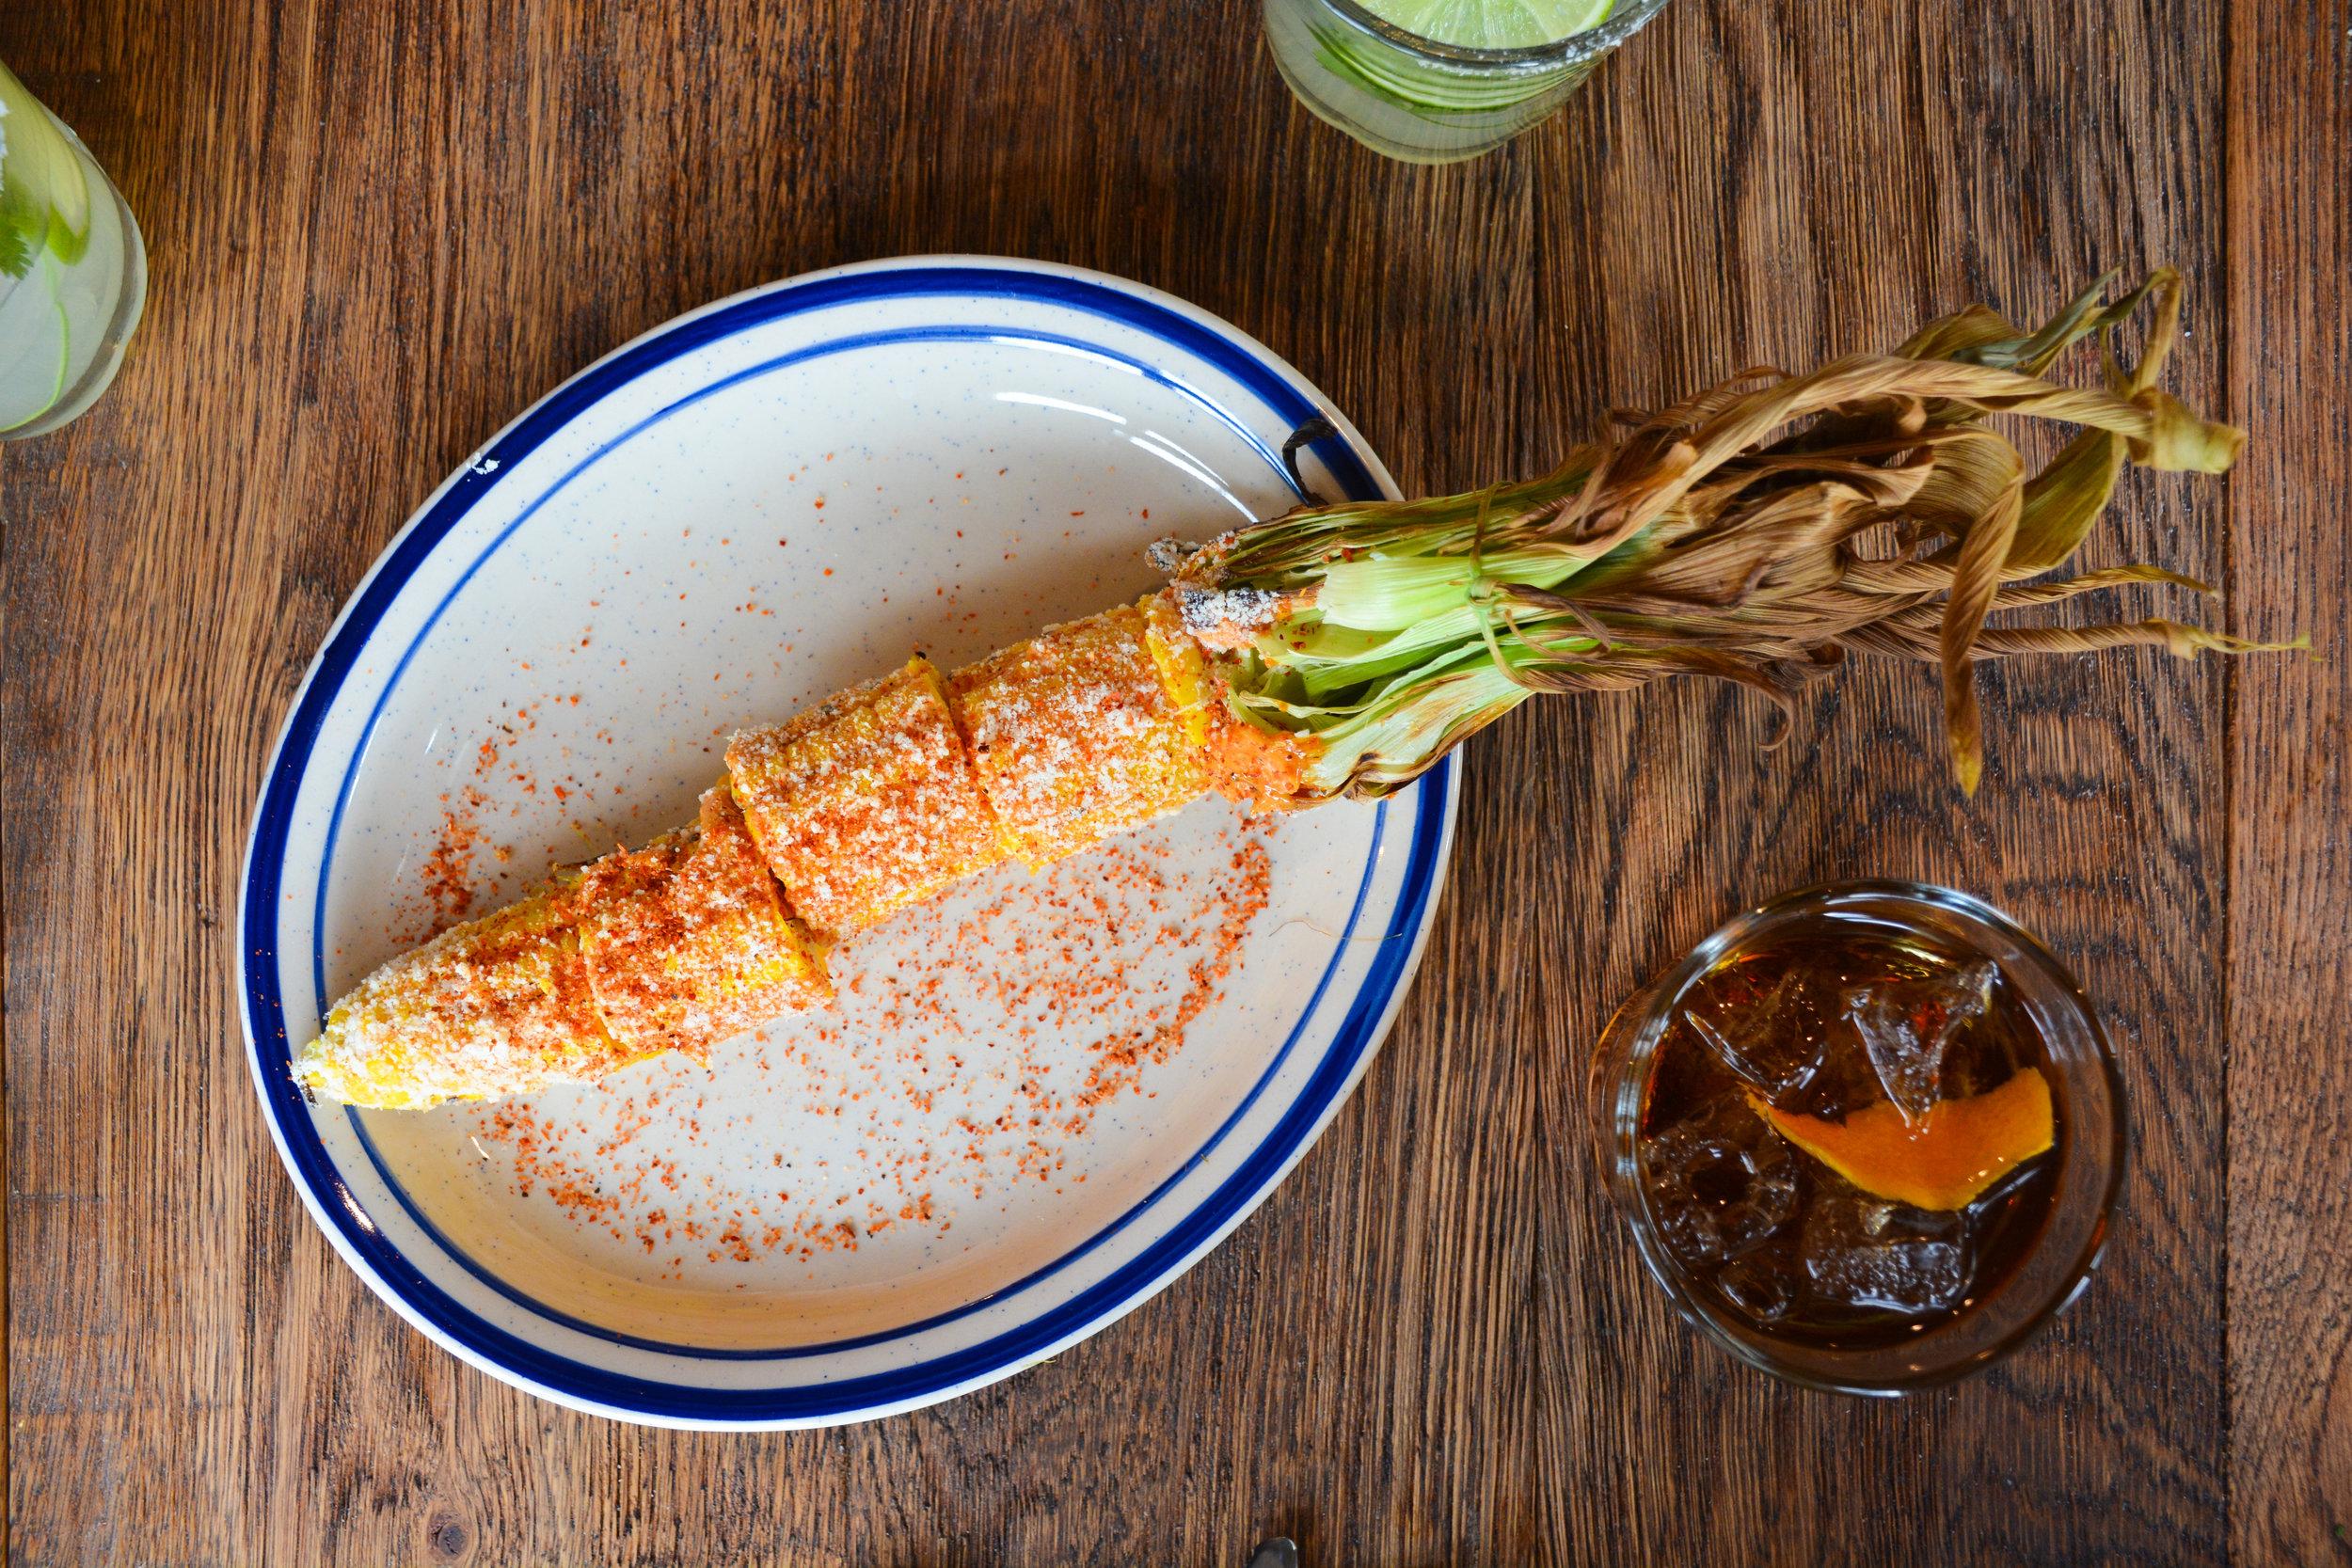 Elote Loco from La Puerta Verde - corn on the cob with spicy citrus mayo, chili &cojita cheese